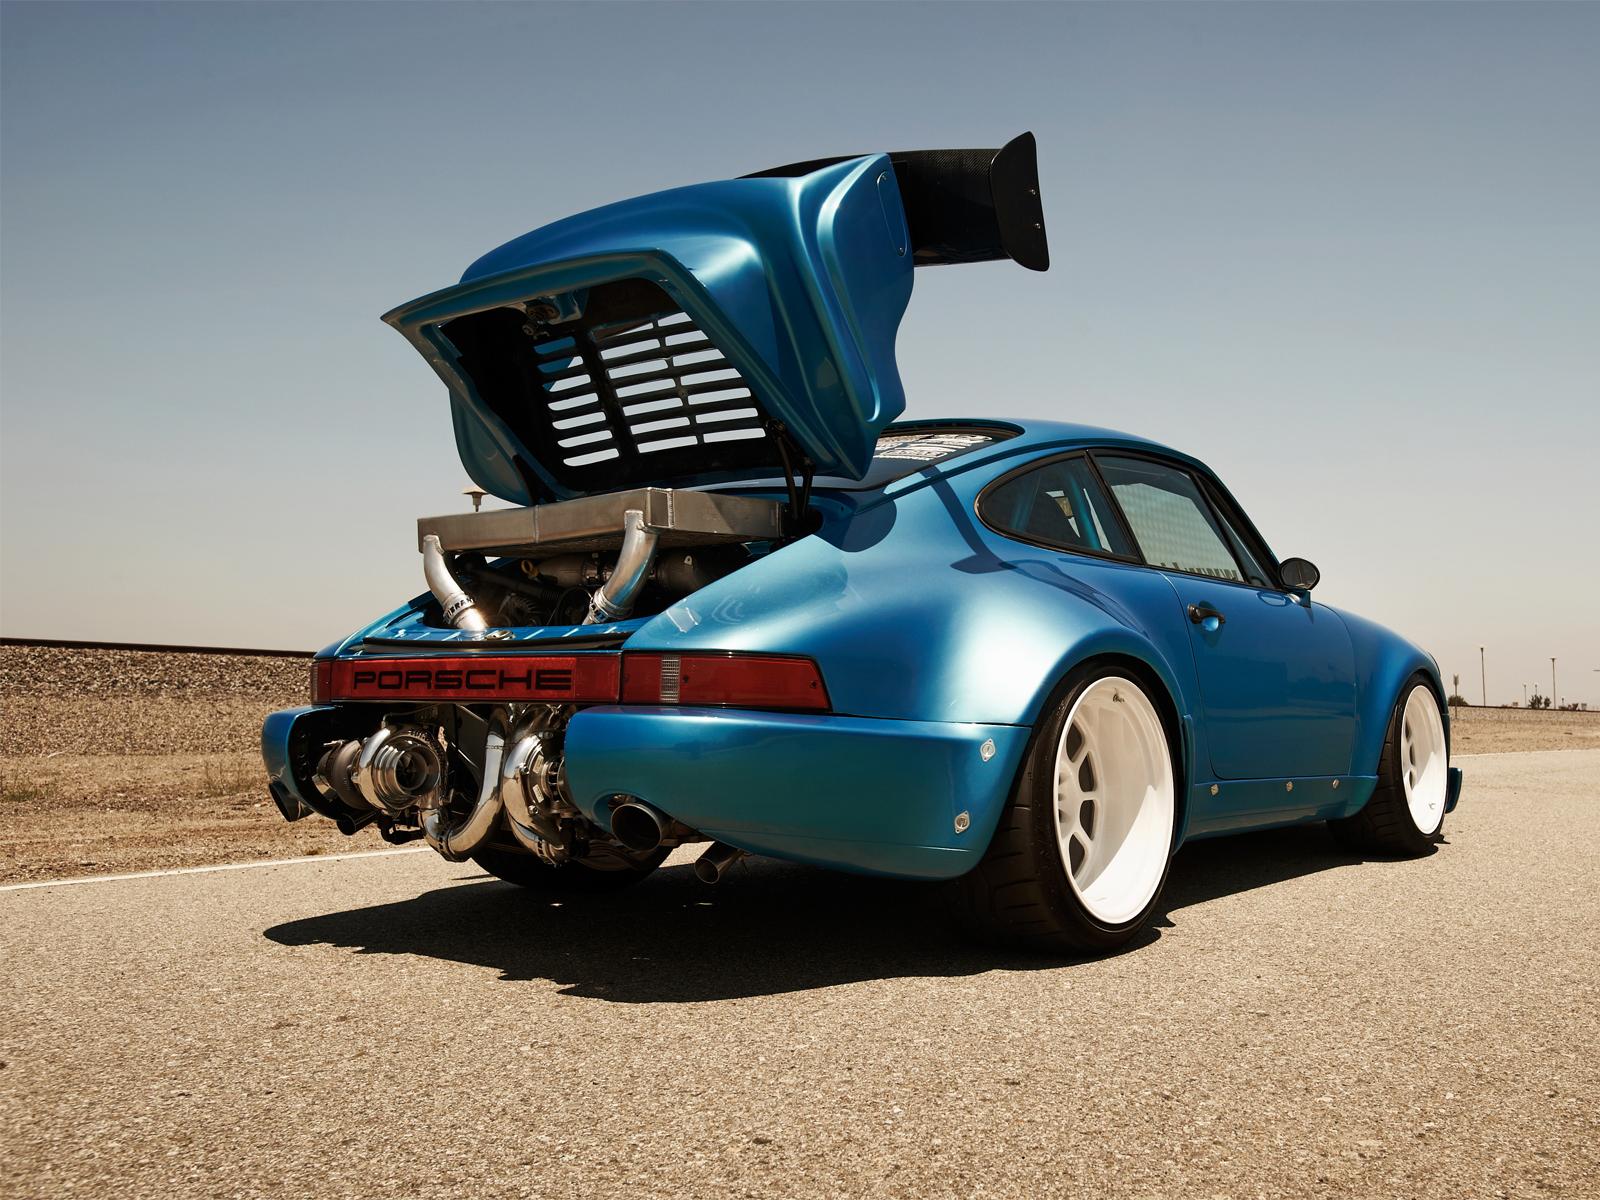 2012 porsche 911 twin turbo coupe supercar supercars tuning engine engines wallpaper 1600x1200 - Porsche engine wallpaper ...